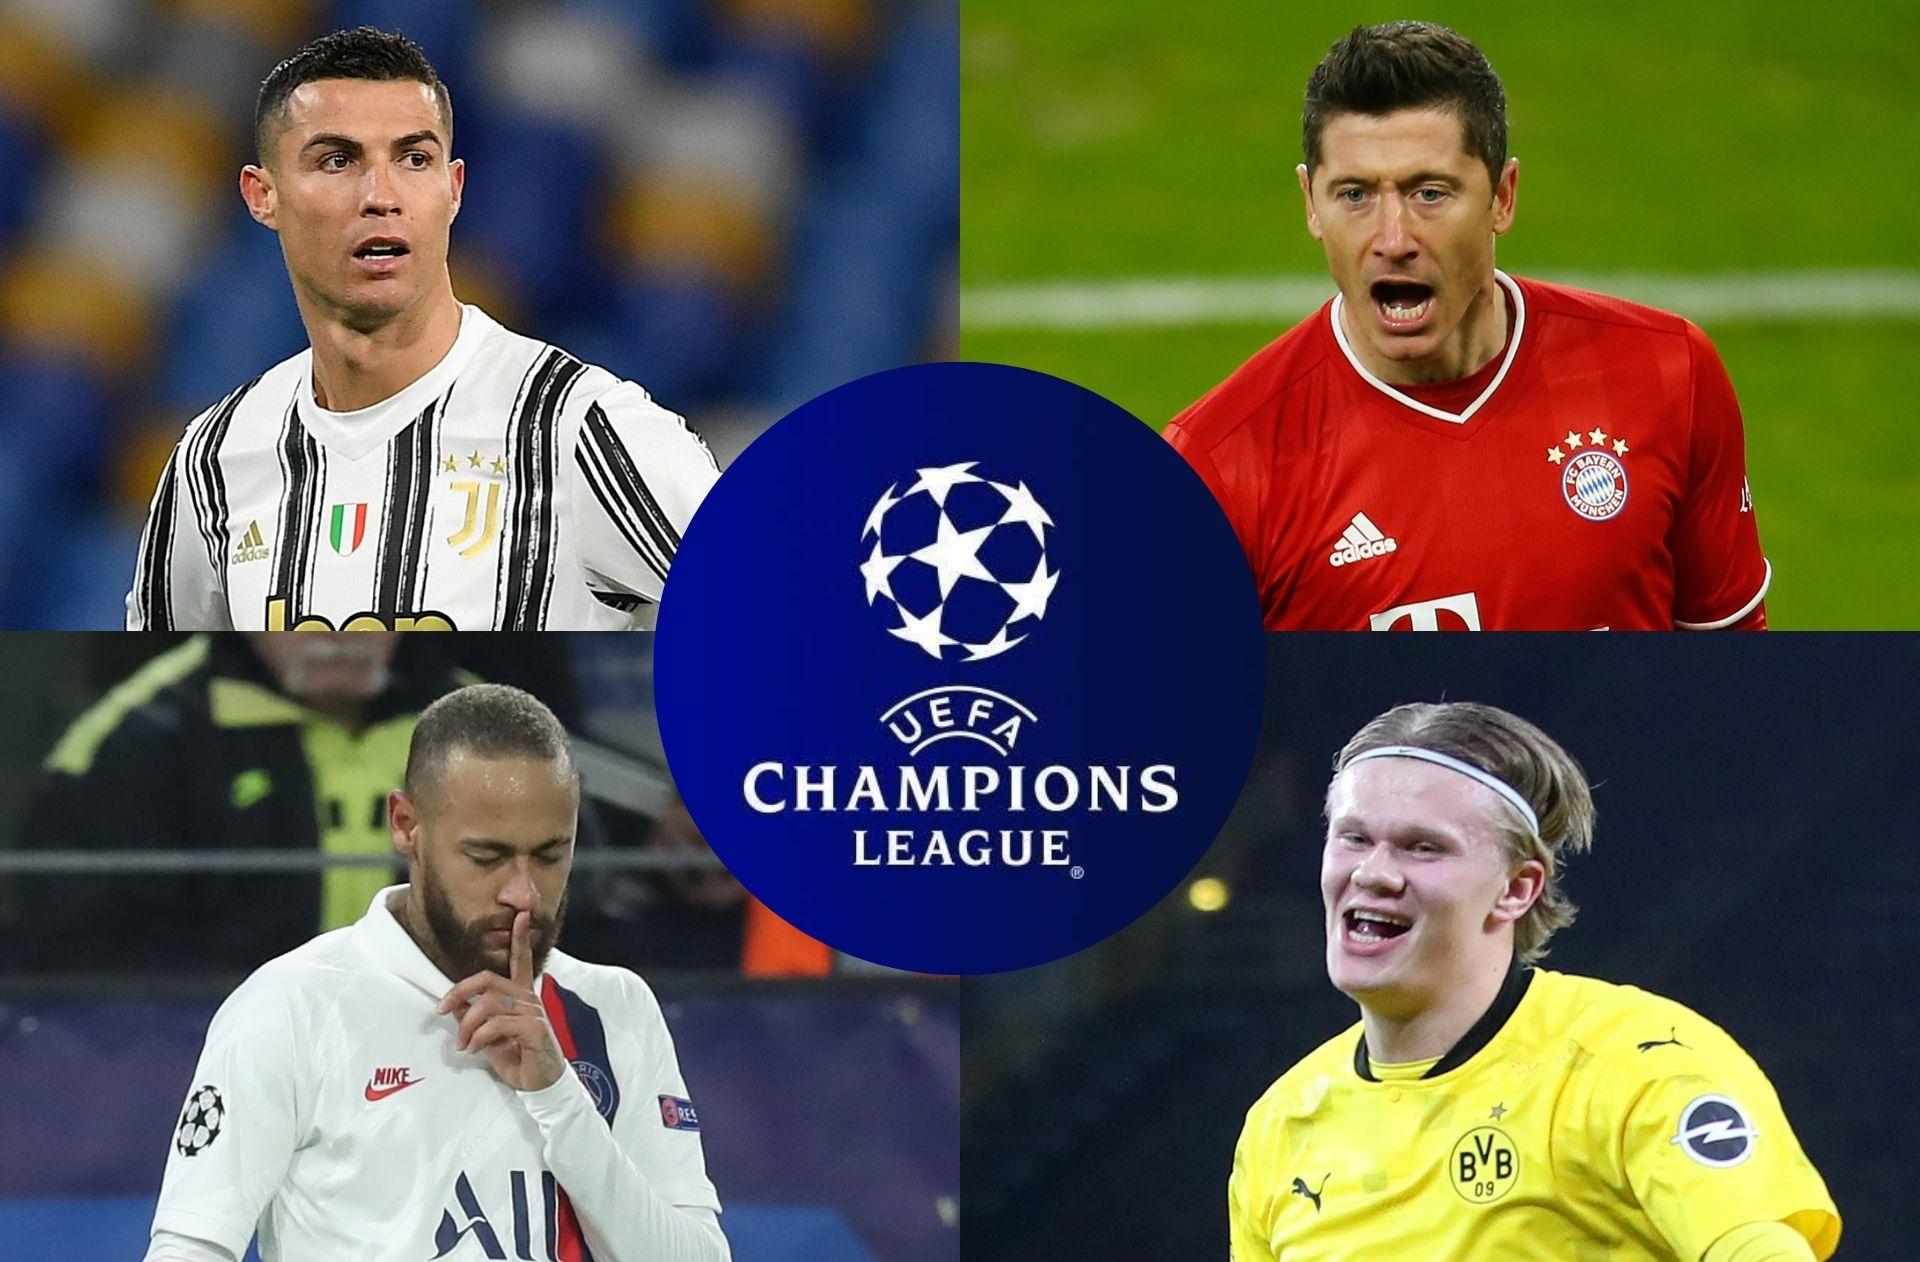 Champions League top-scorers